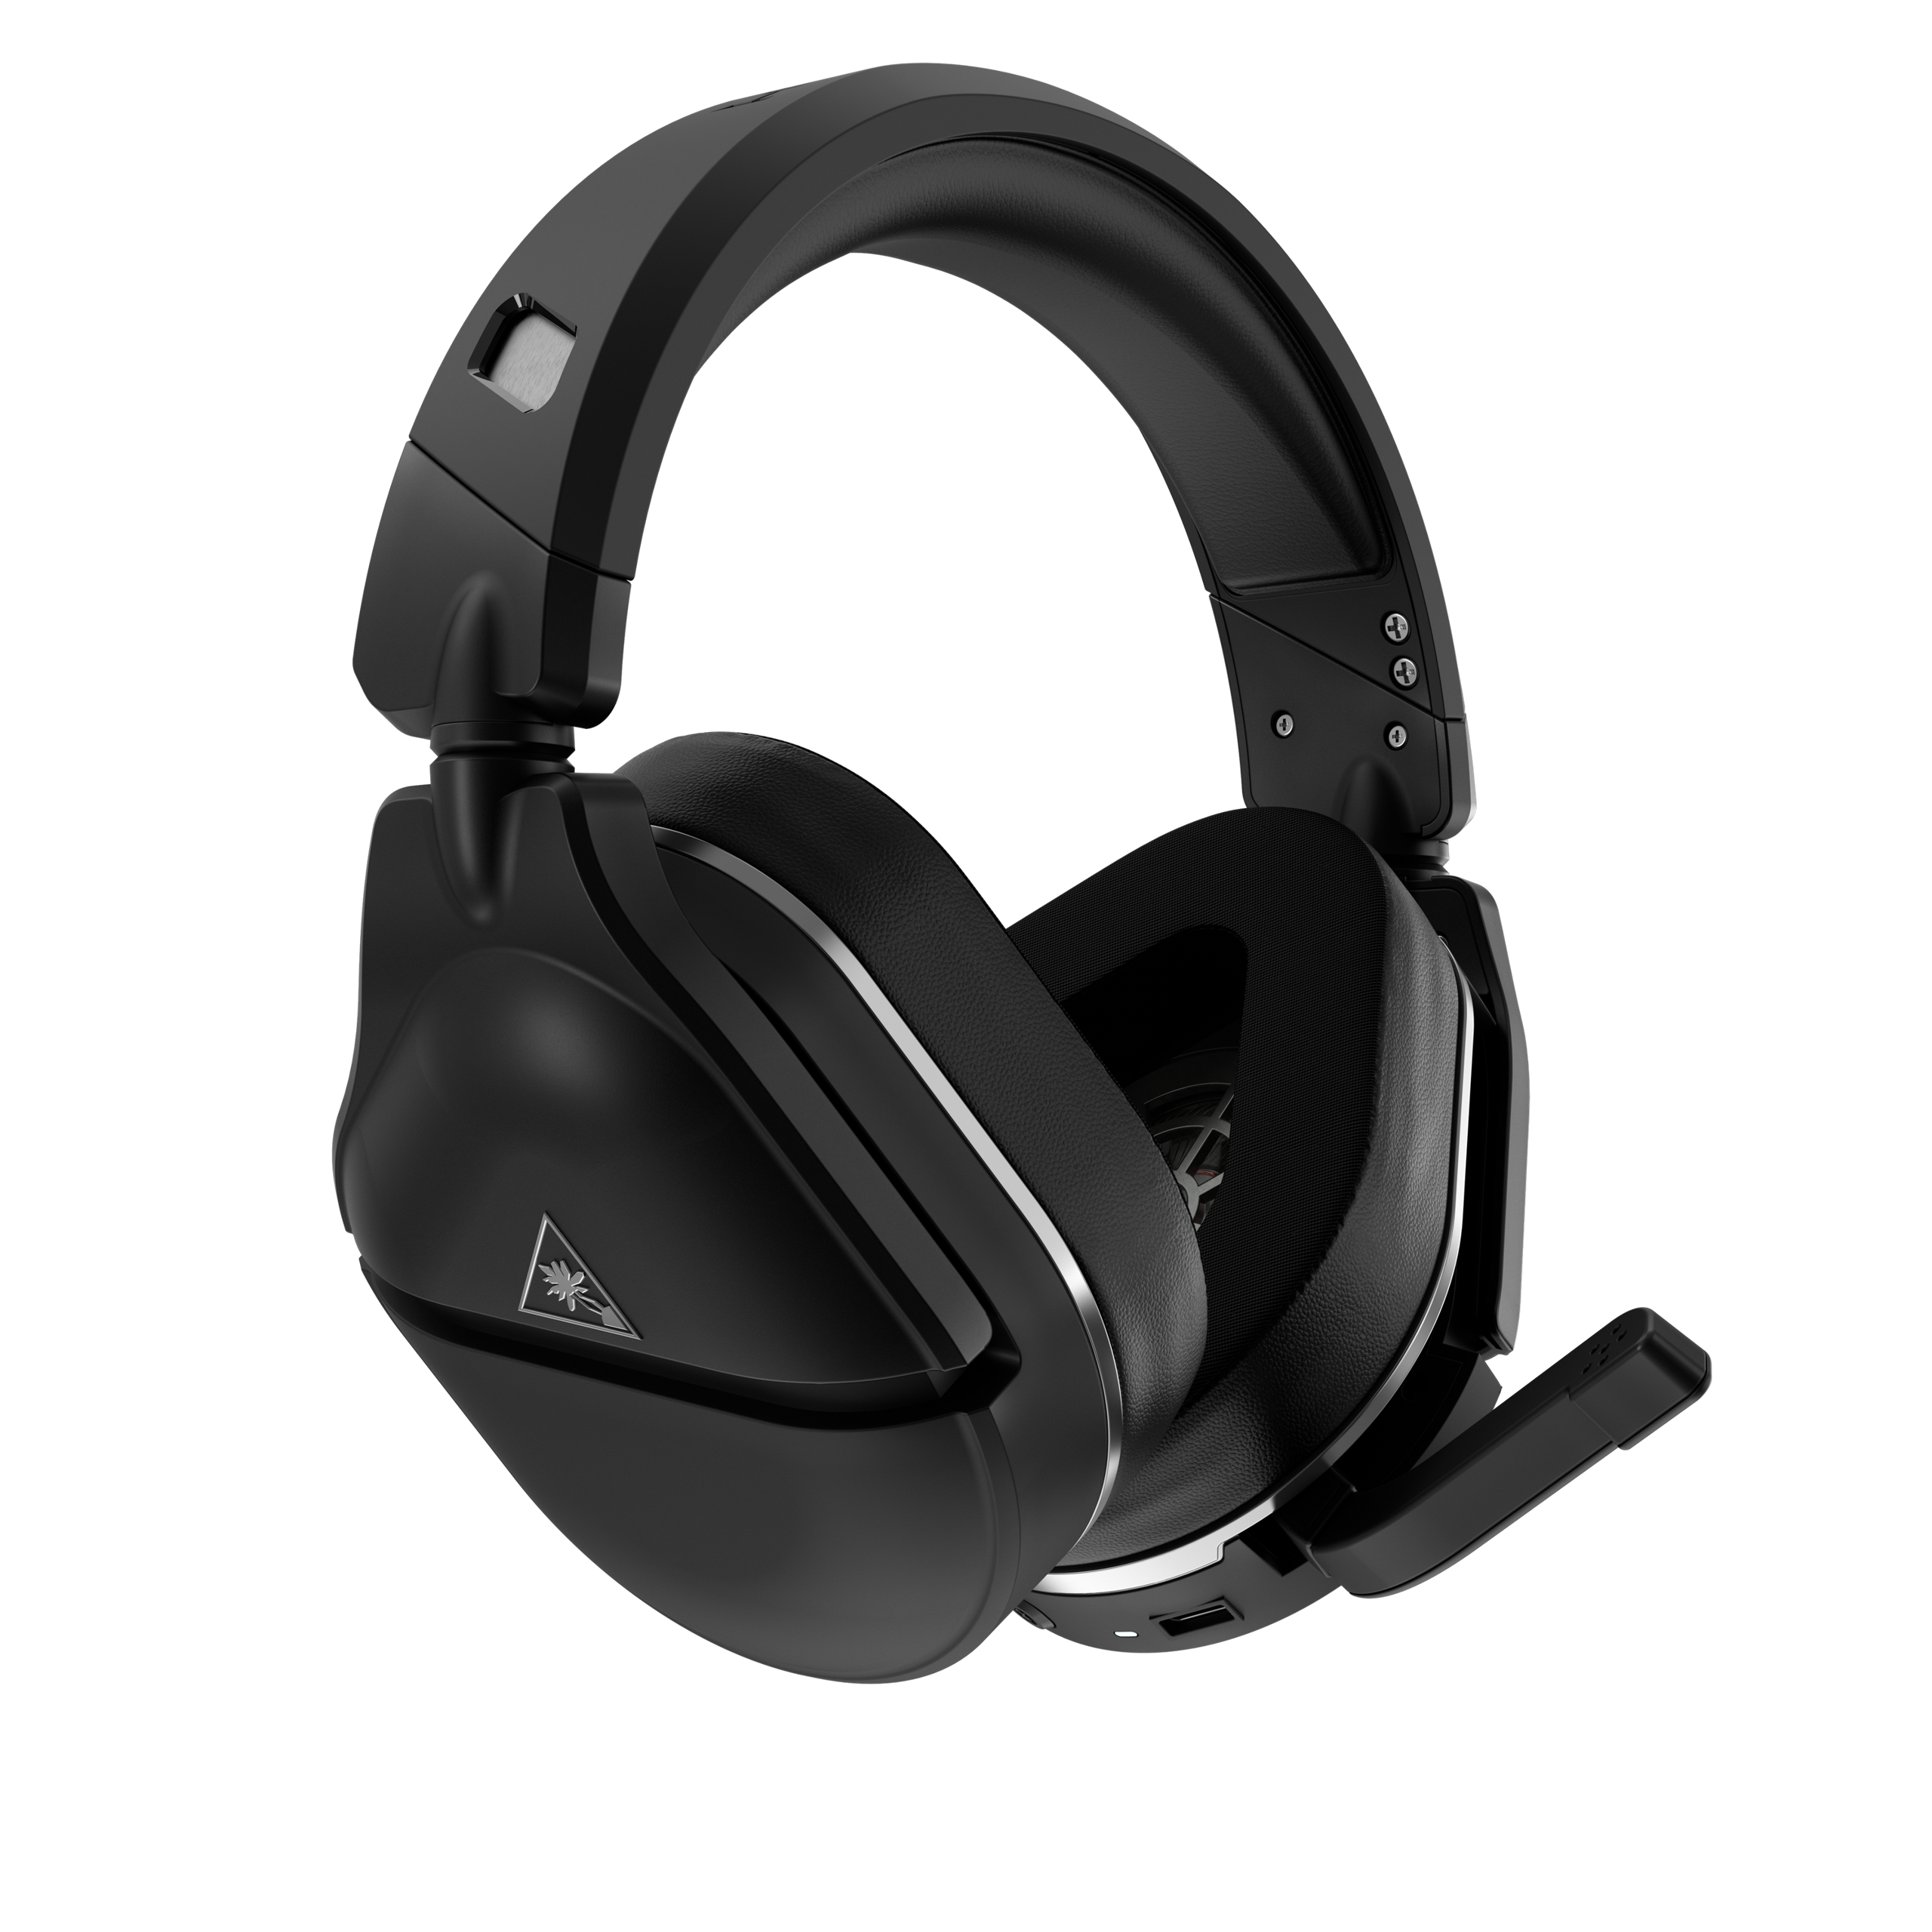 Stealth 700 Gen 2 Headset - PlayStation®